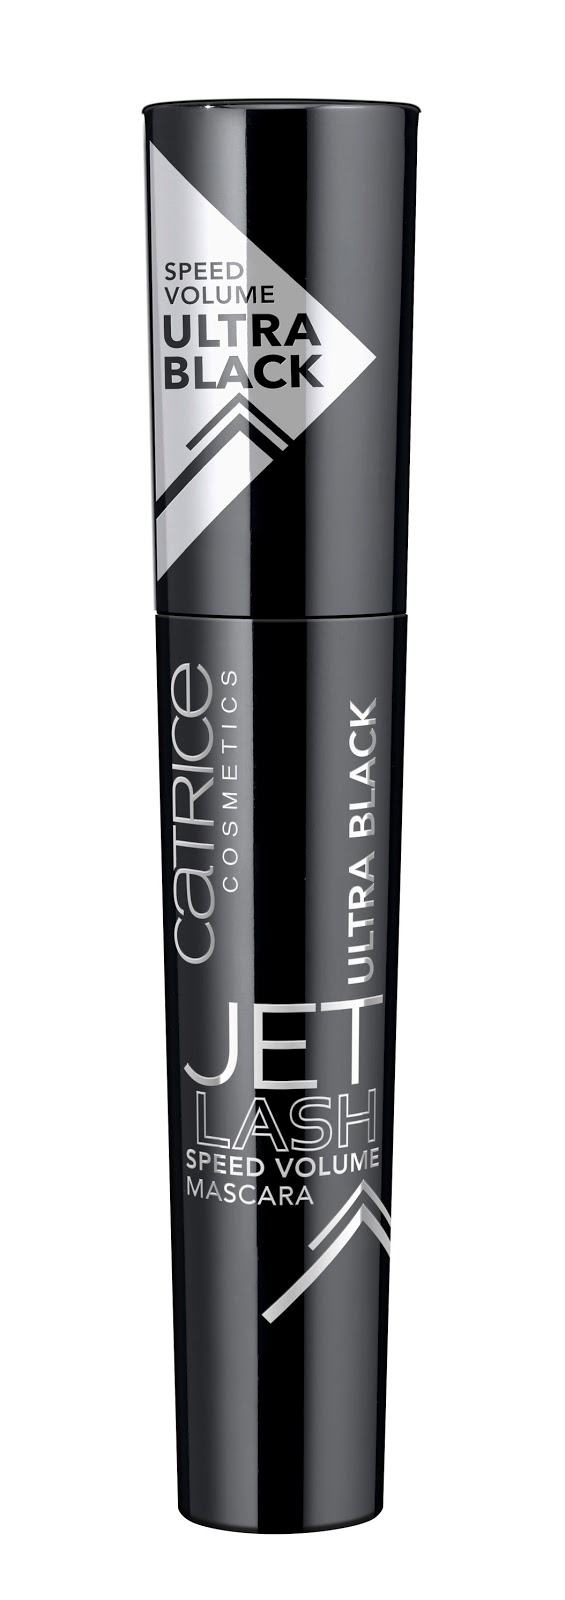 Catrice - Jet Lash – Speed Volume Mascara Ultra Black and Waterproof